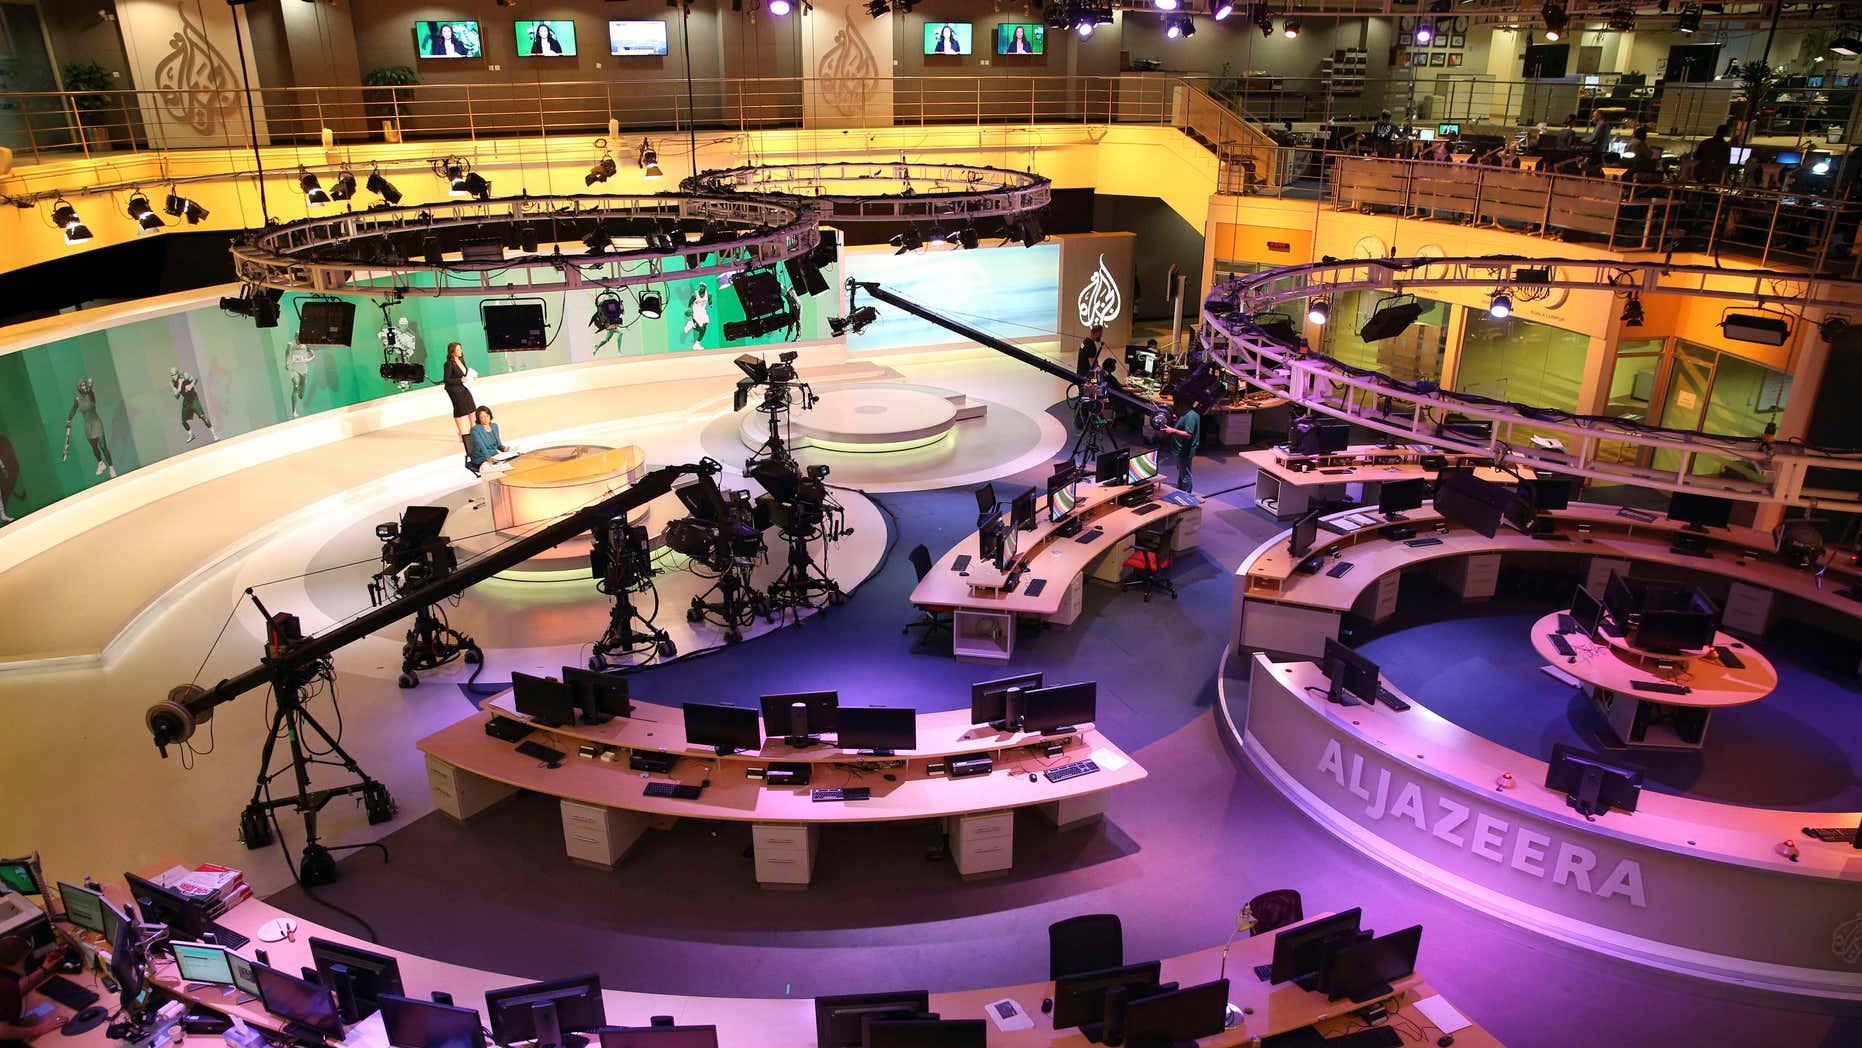 Jan. 1, 2015: Staff members of Al-Jazeera International work at the news studio in Doha, Qatar.